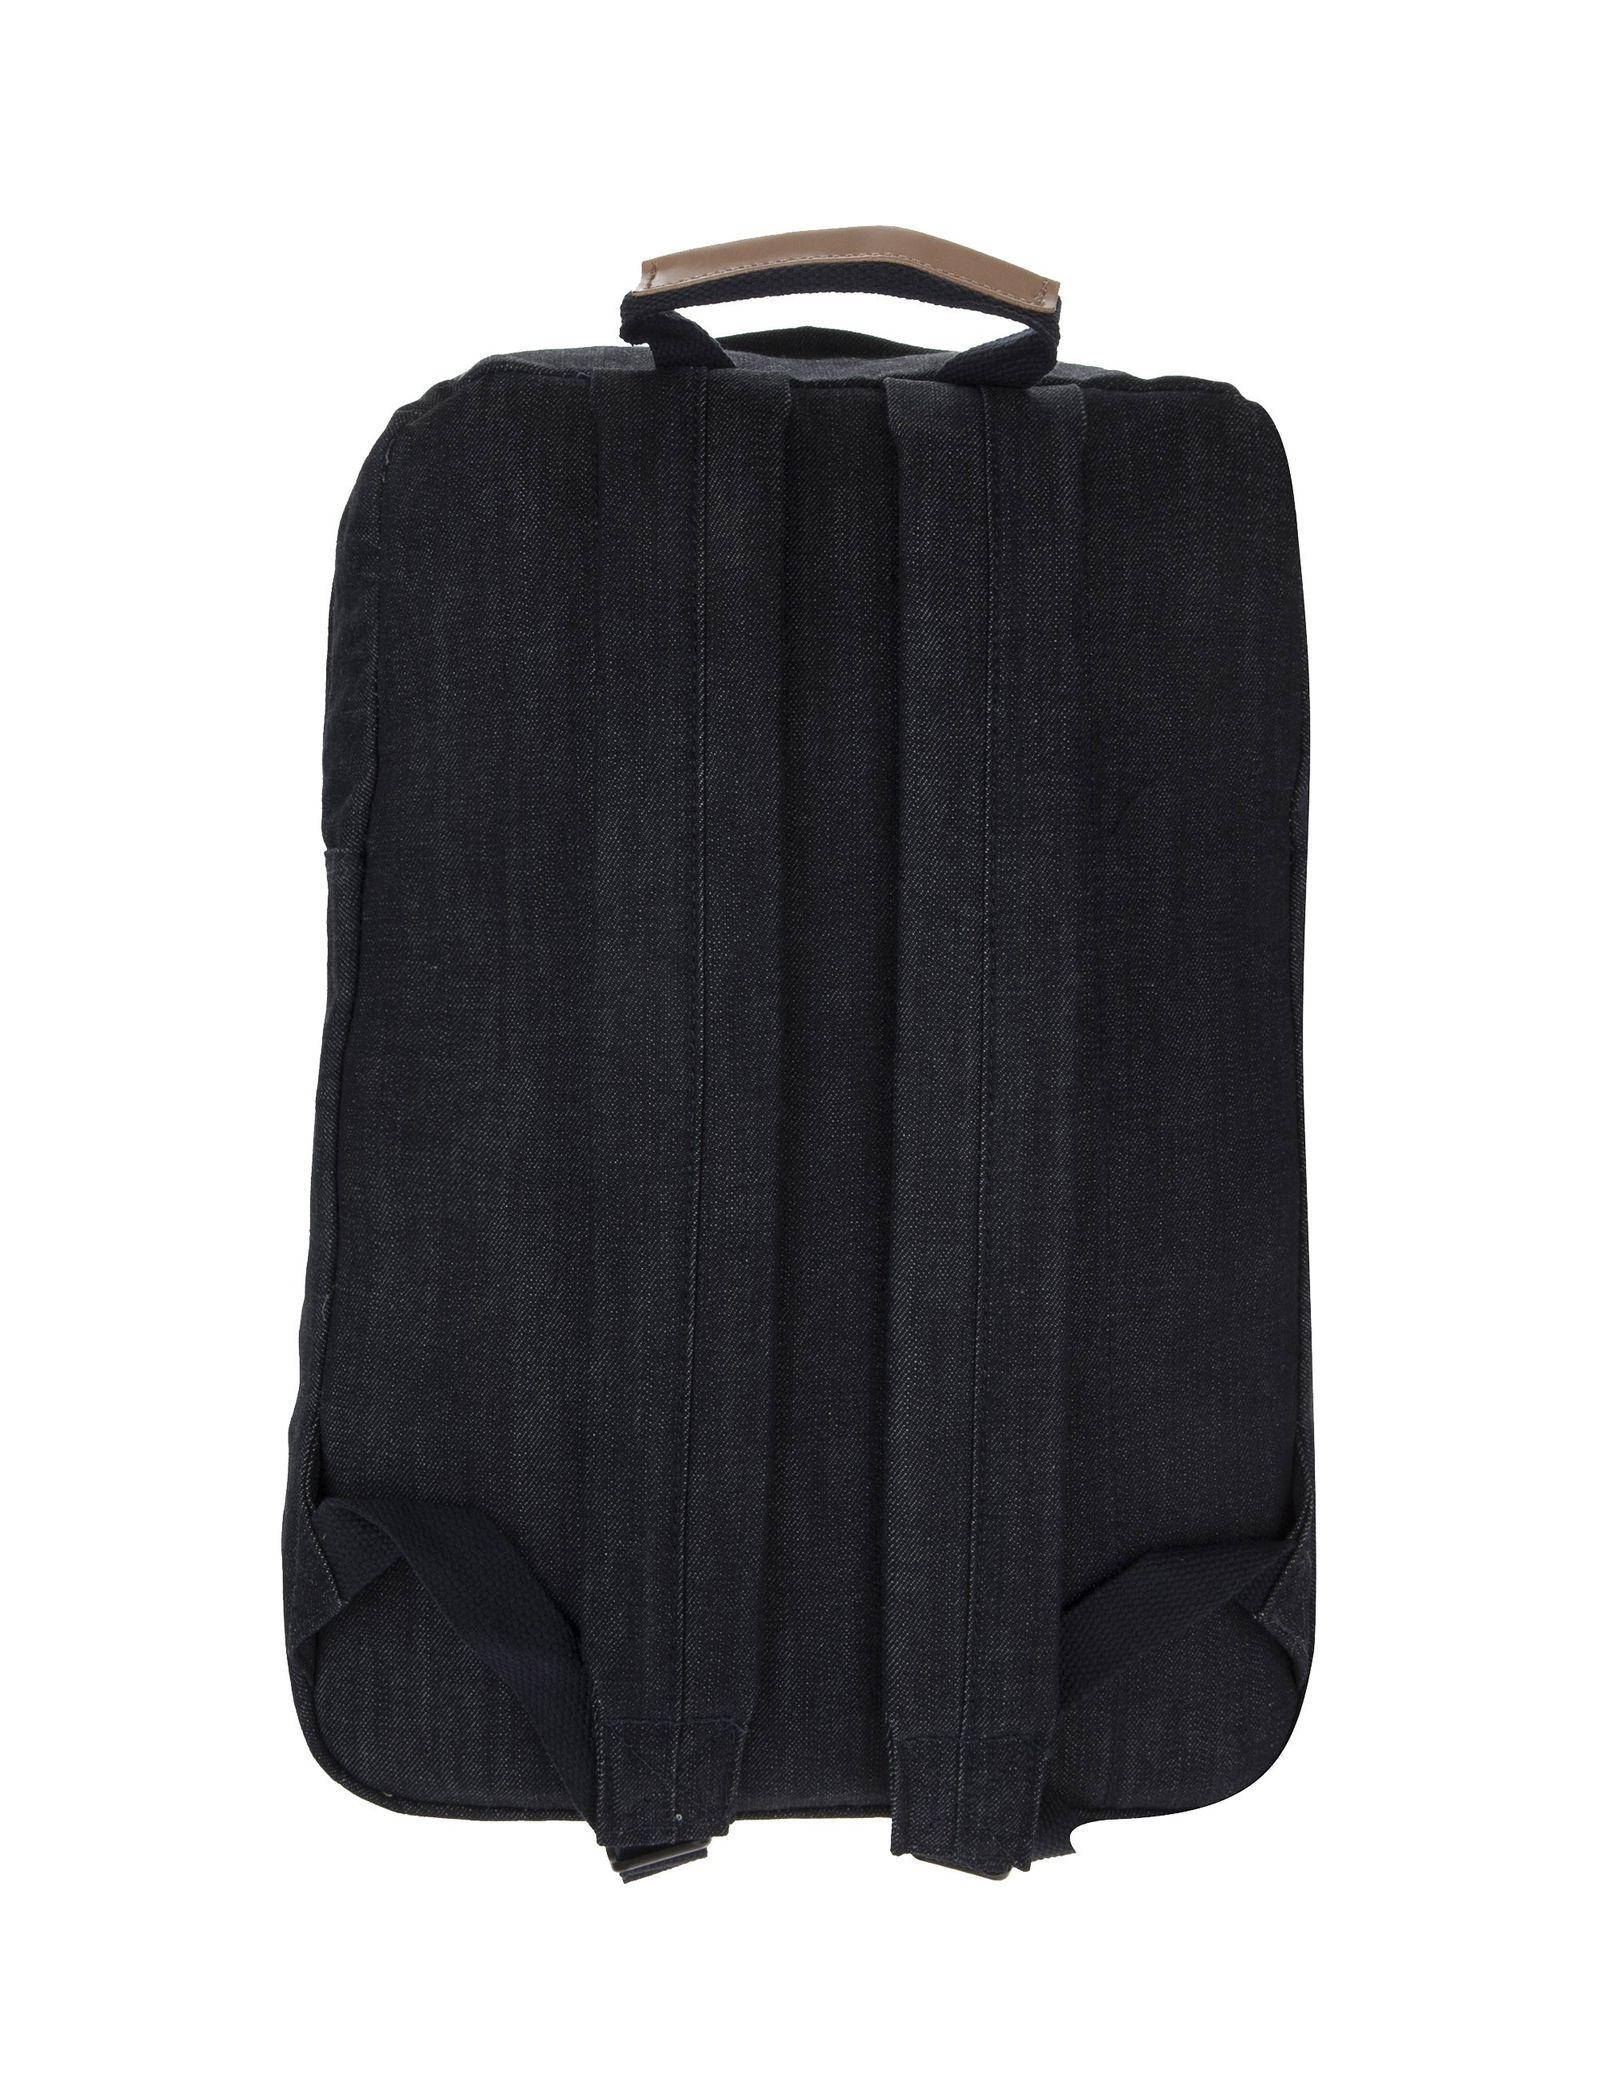 کوله پشتی روزمره مردانه - یوپیم تک سایز - سرمه اي - 2